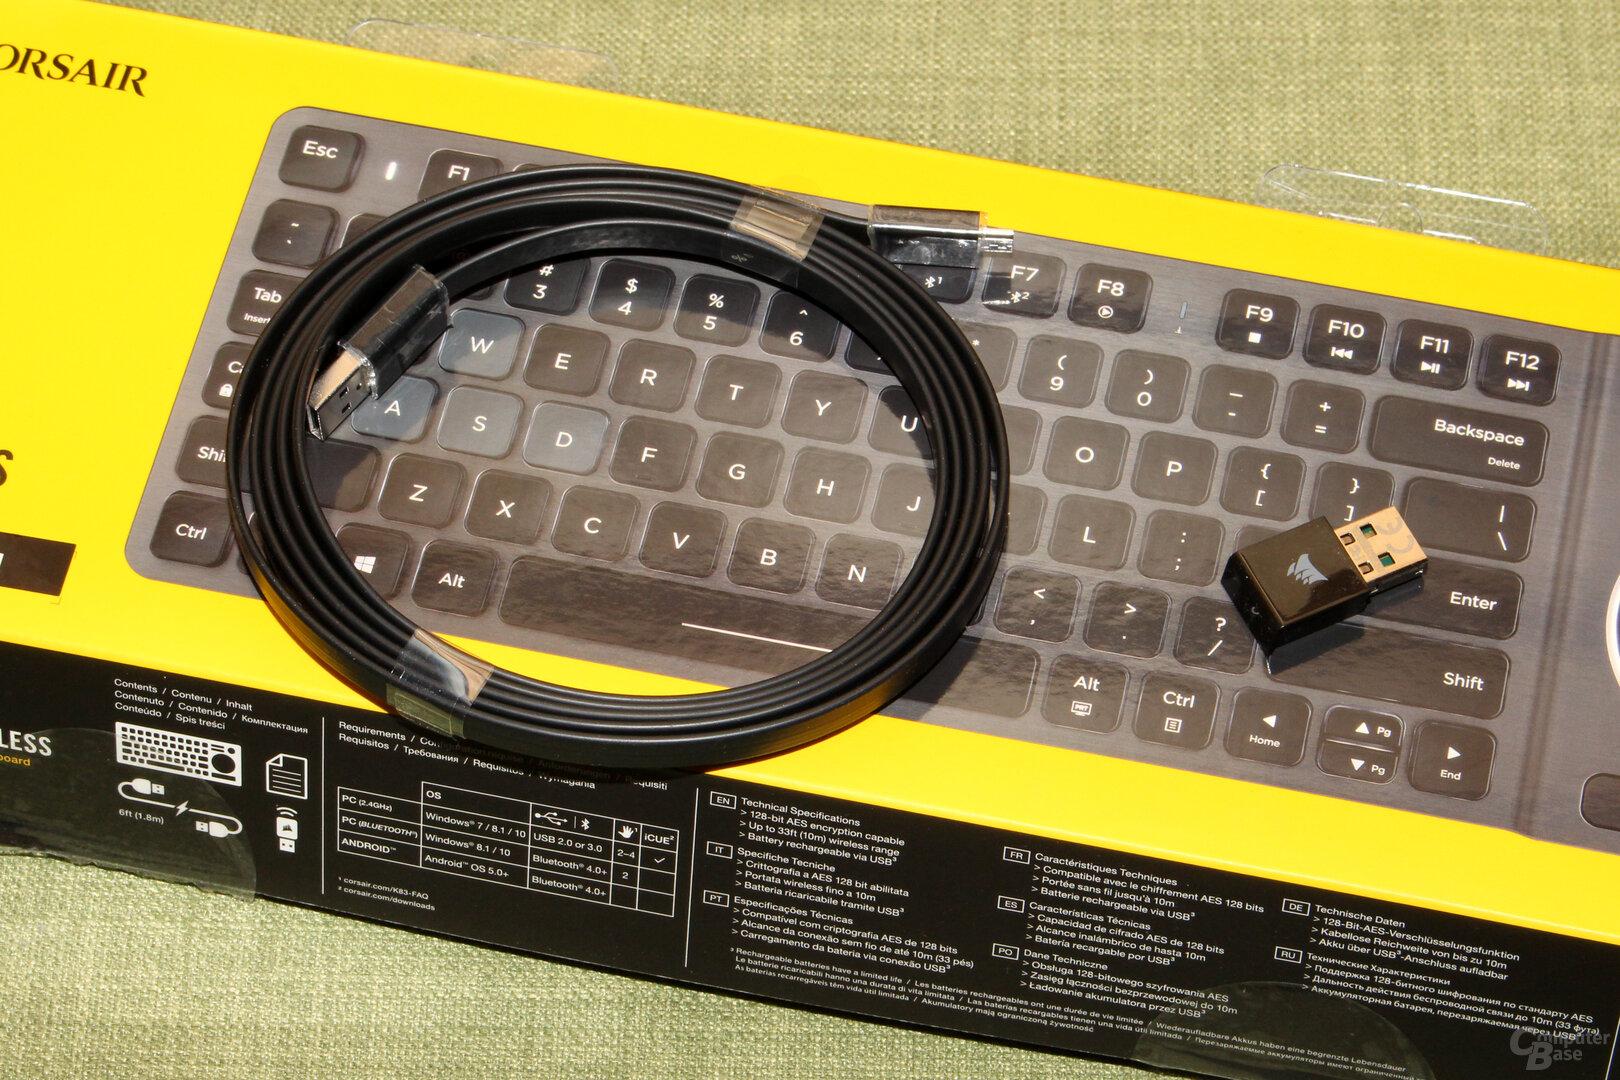 Zubehör: USB-Label, Funkadapter